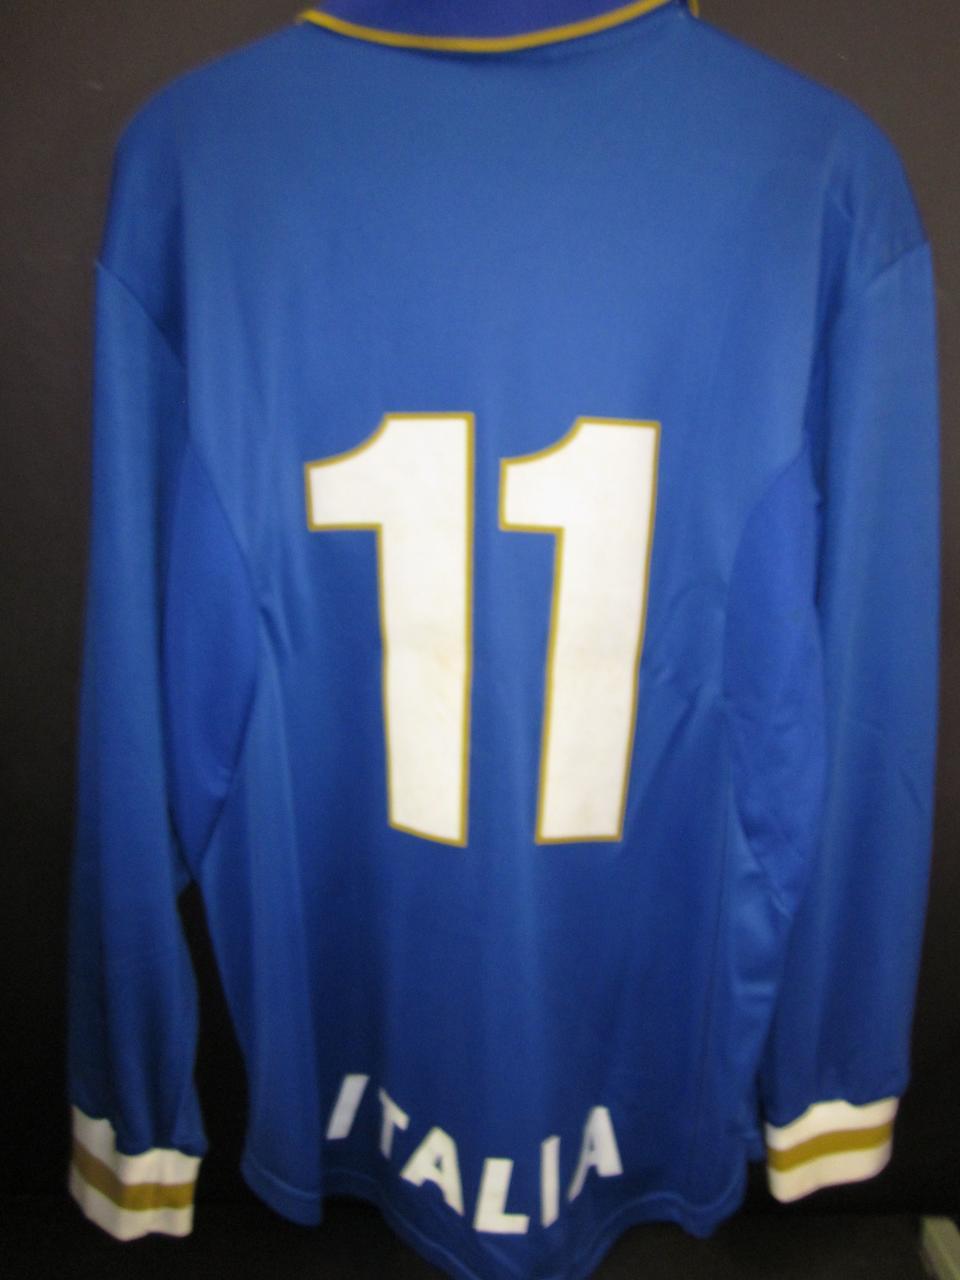 1997 Gianfranco Zola match worn Italy shirt